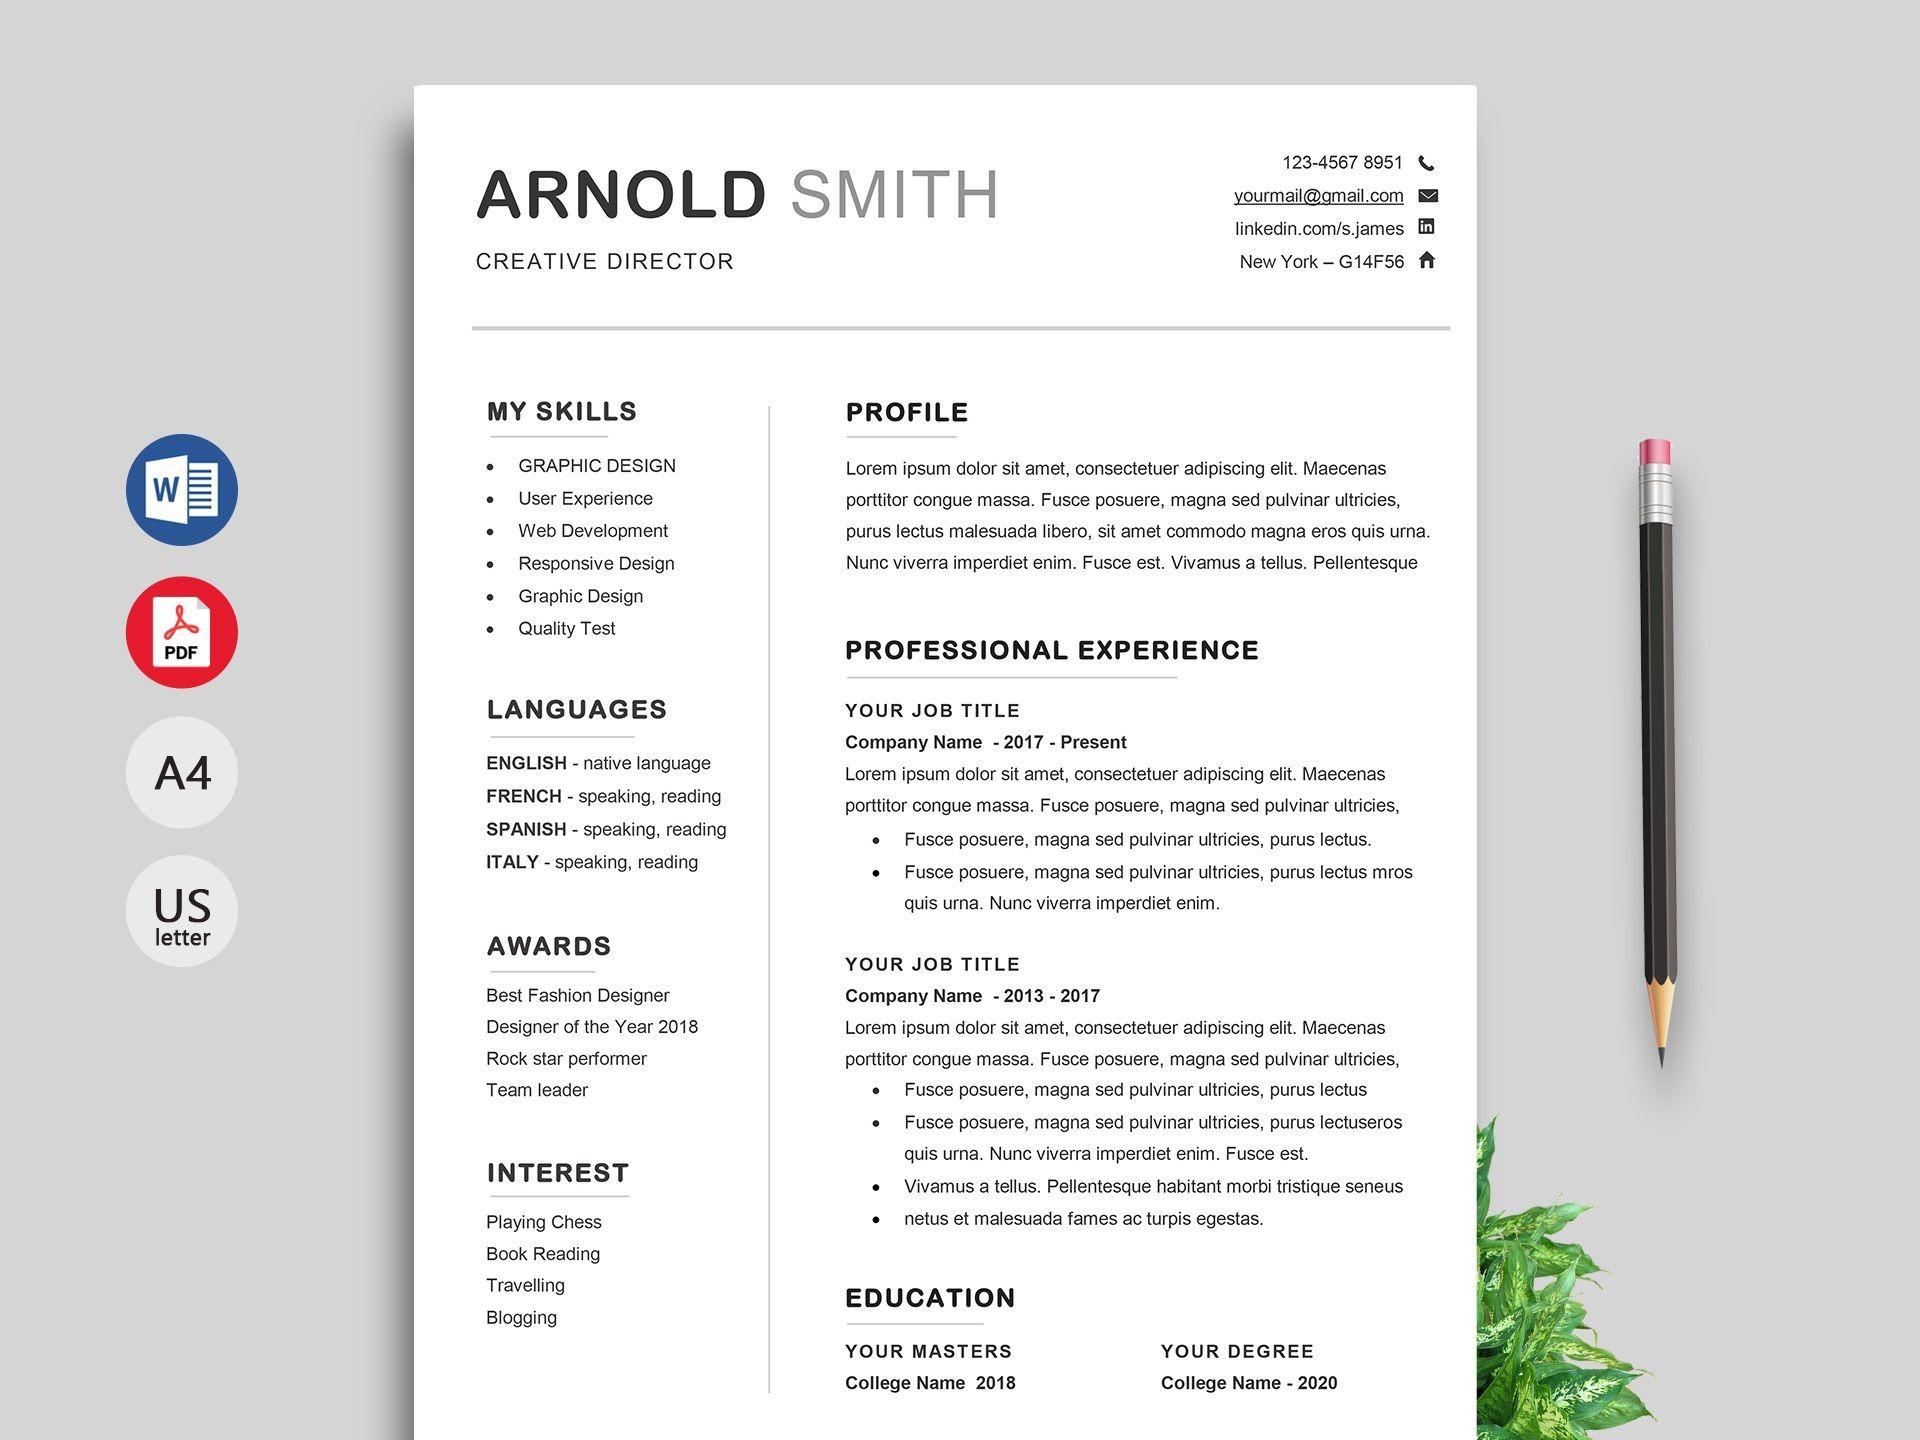 001 Best Professional Resume Template 2019 Free Download Idea  Cv1920